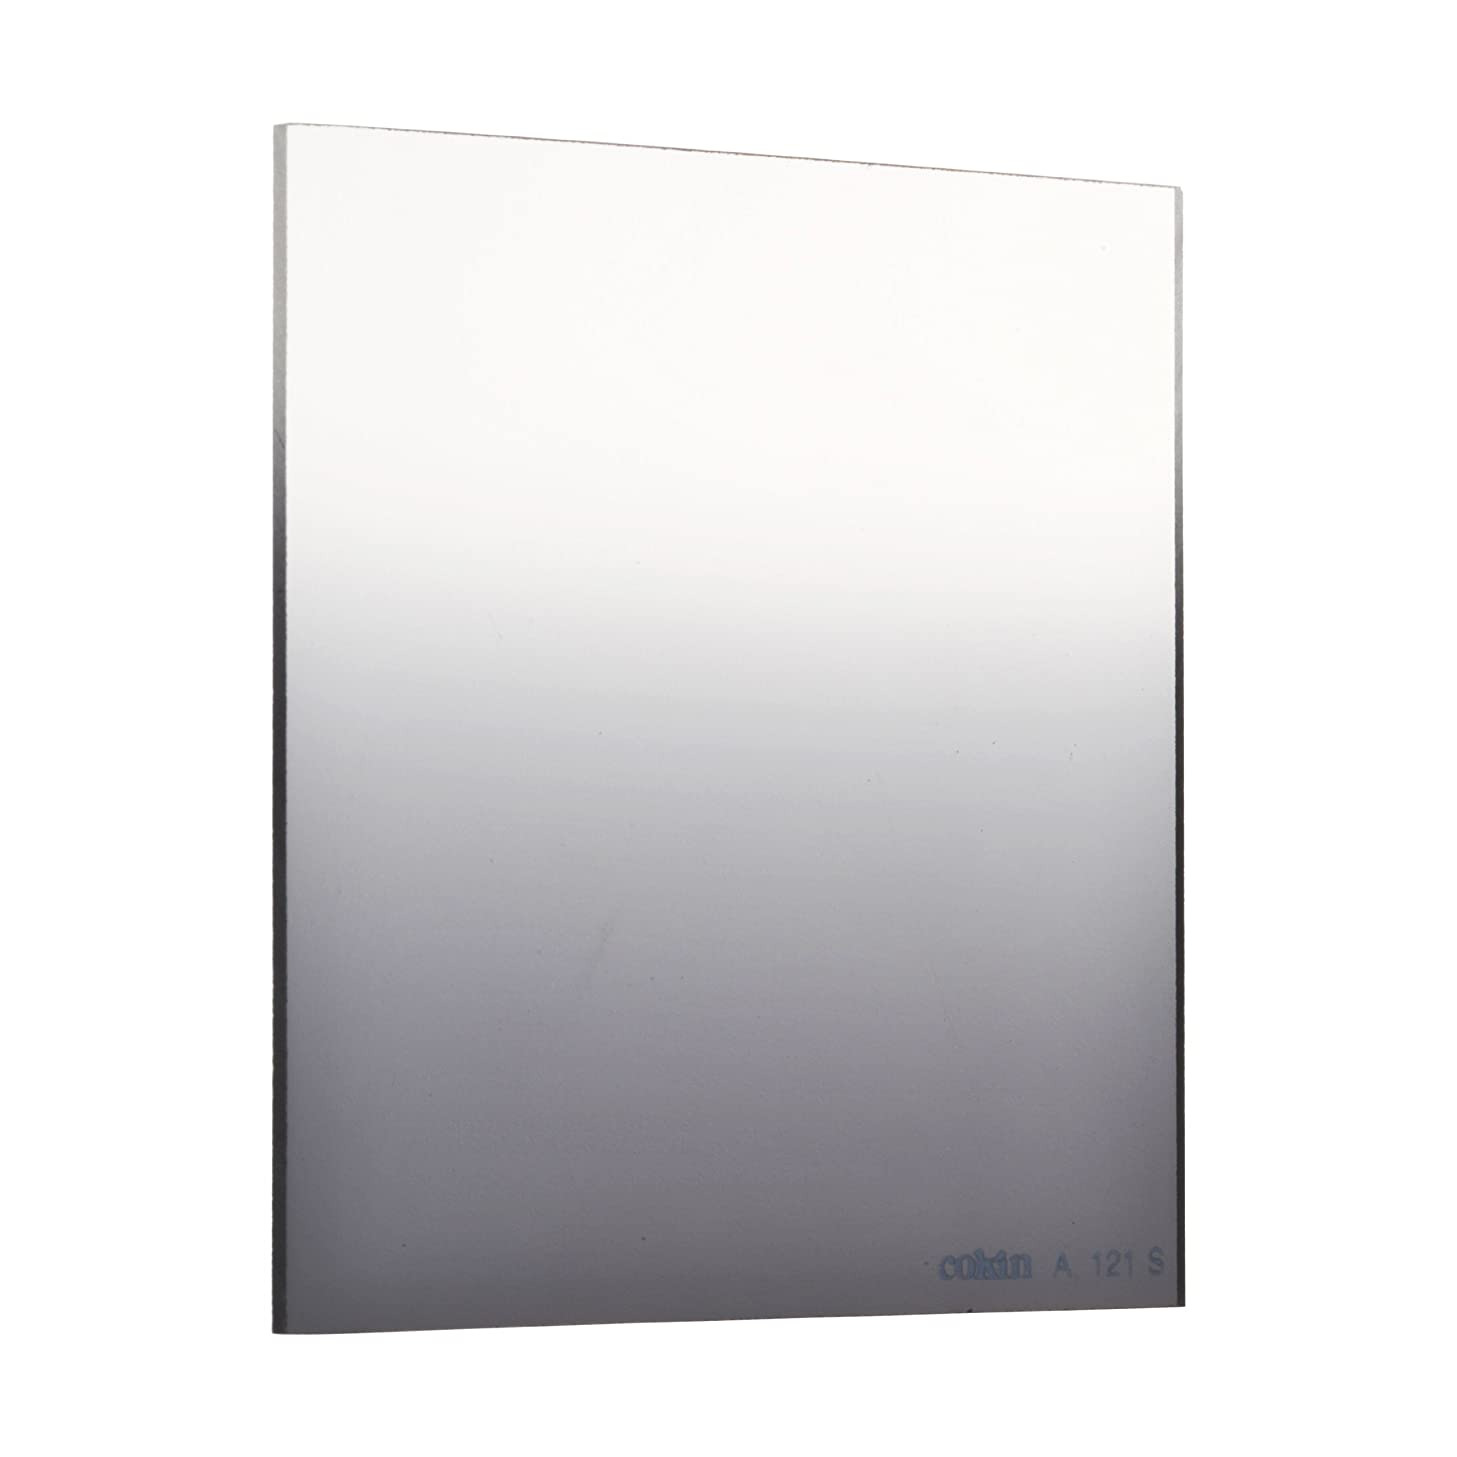 Cokin A121S Filter, A, Gradual Grey G2 Soft